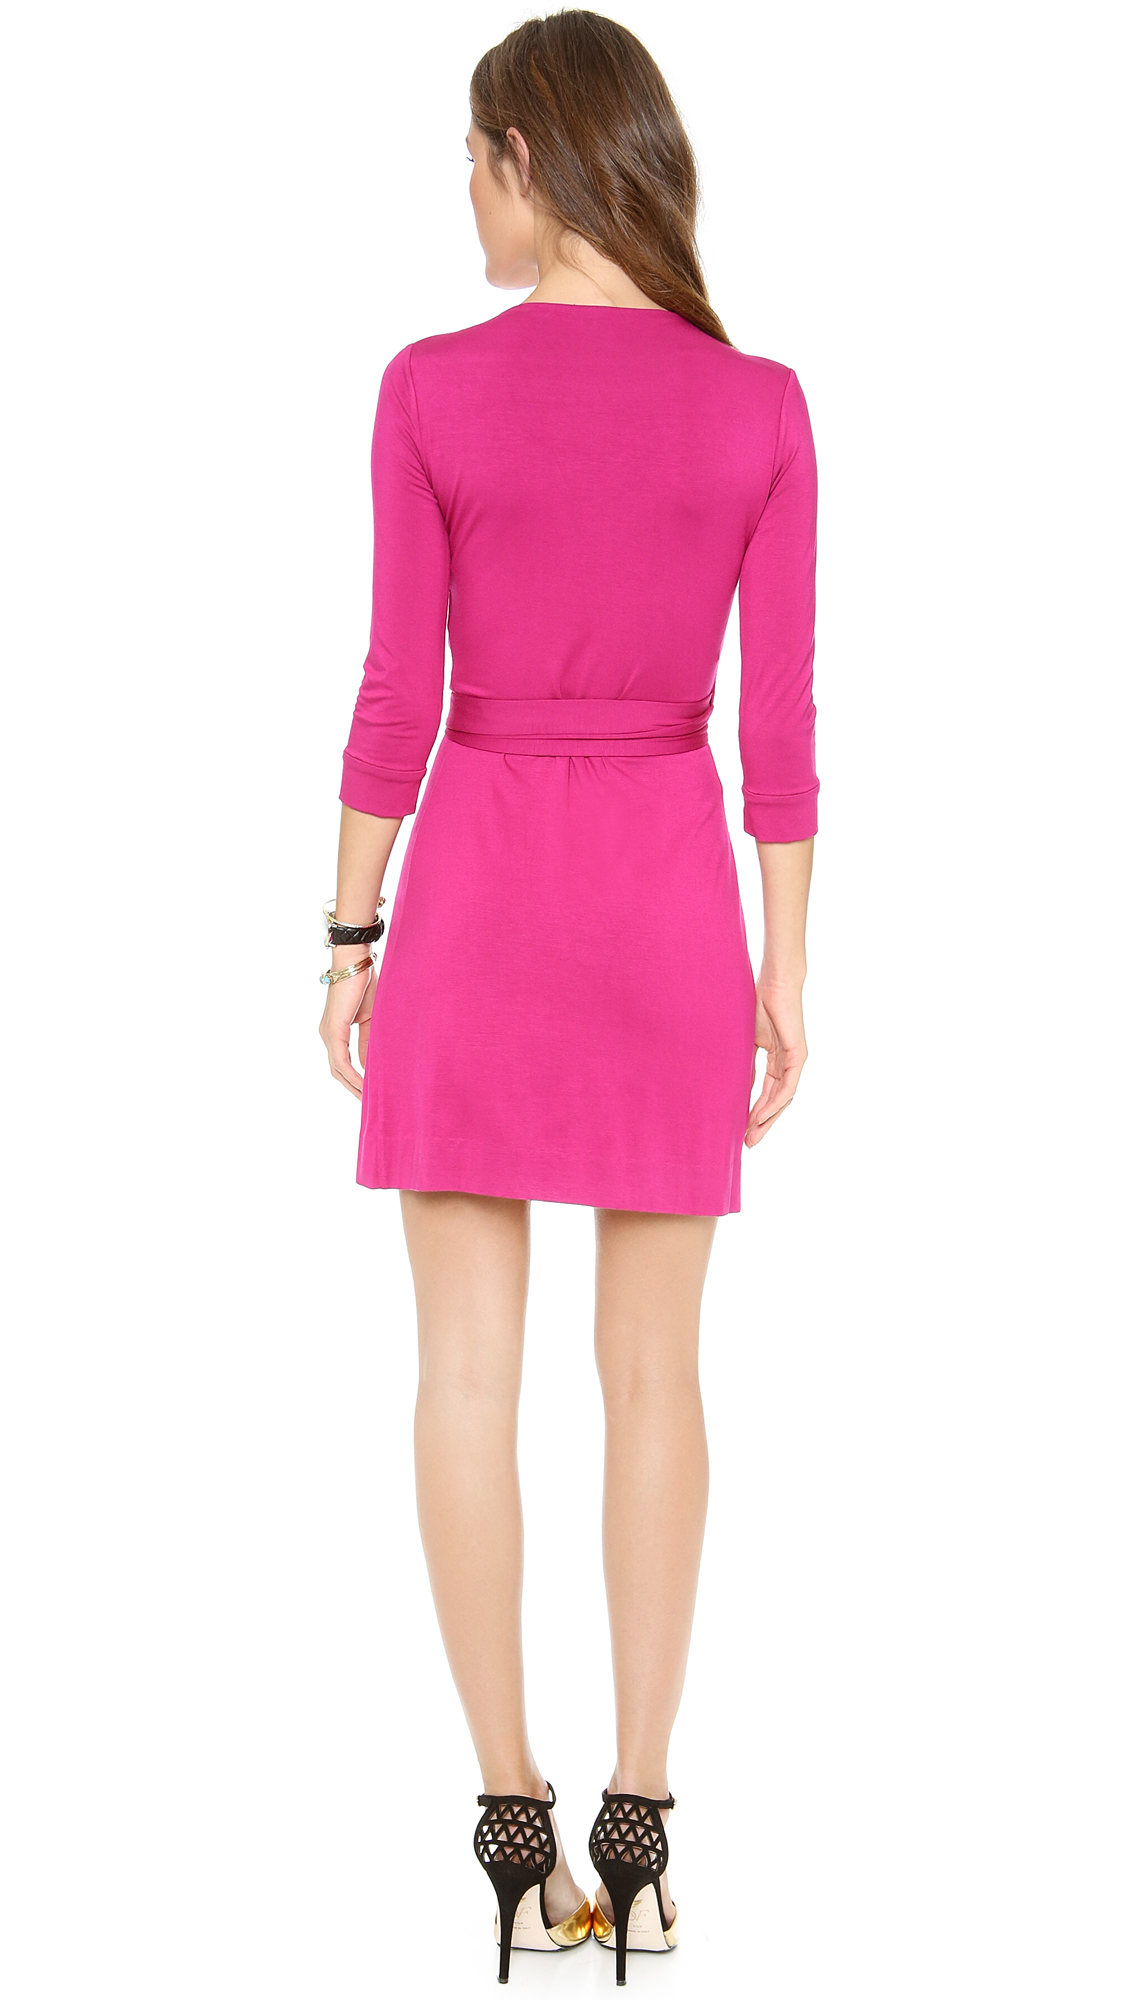 9dd1850741a1 Diane von Furstenberg New Julian Mini Wrap Dress | SHOPBOP